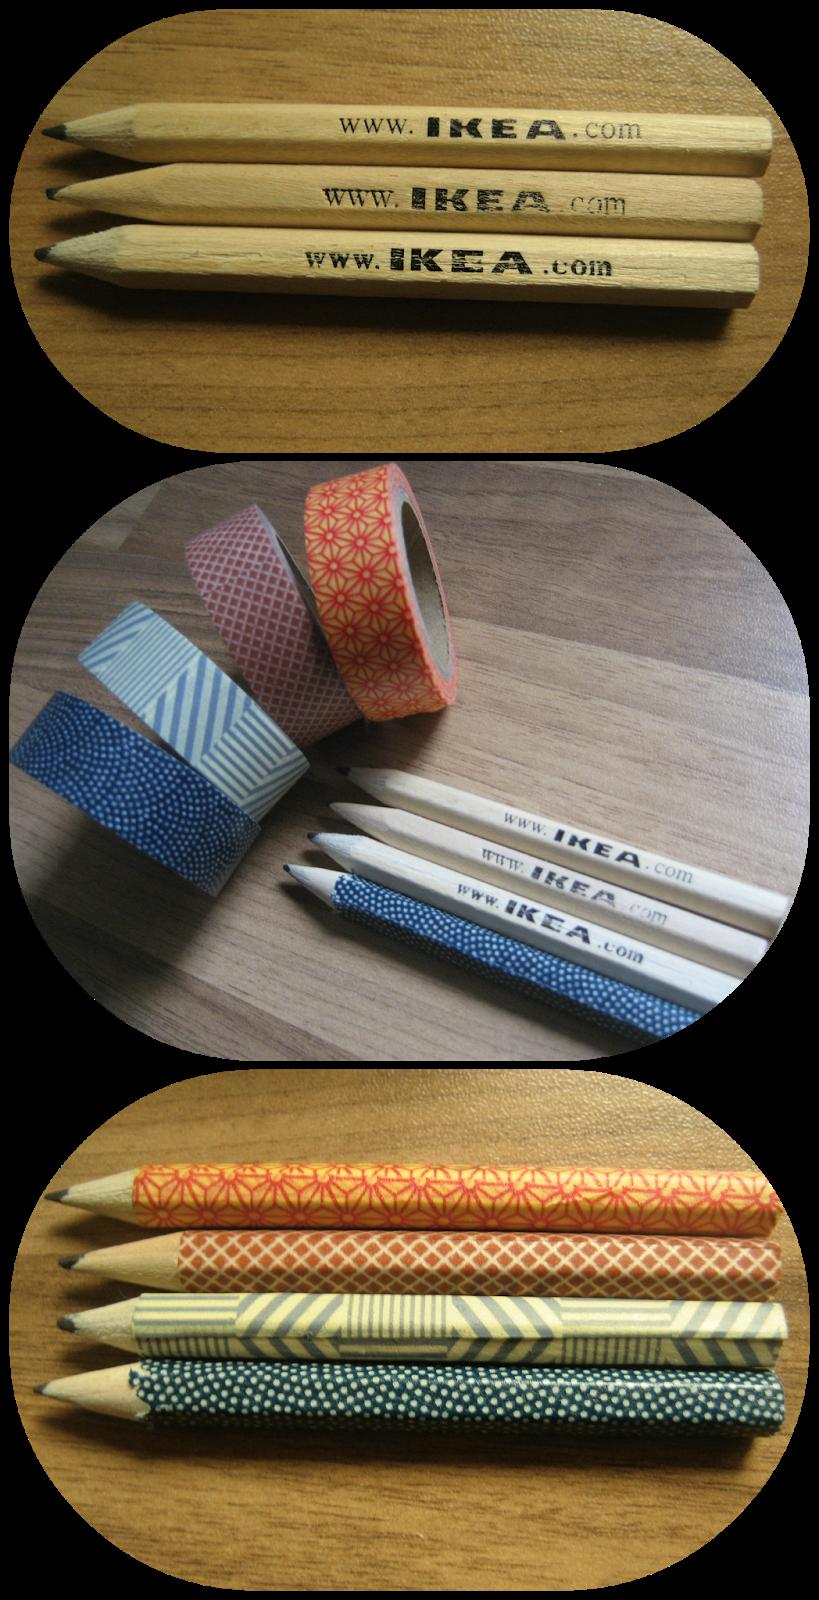 Ideas : Quand nos crayons ordinaires deviennent… Extraordinaire avec du ruban adhésif #IKEA #DIY